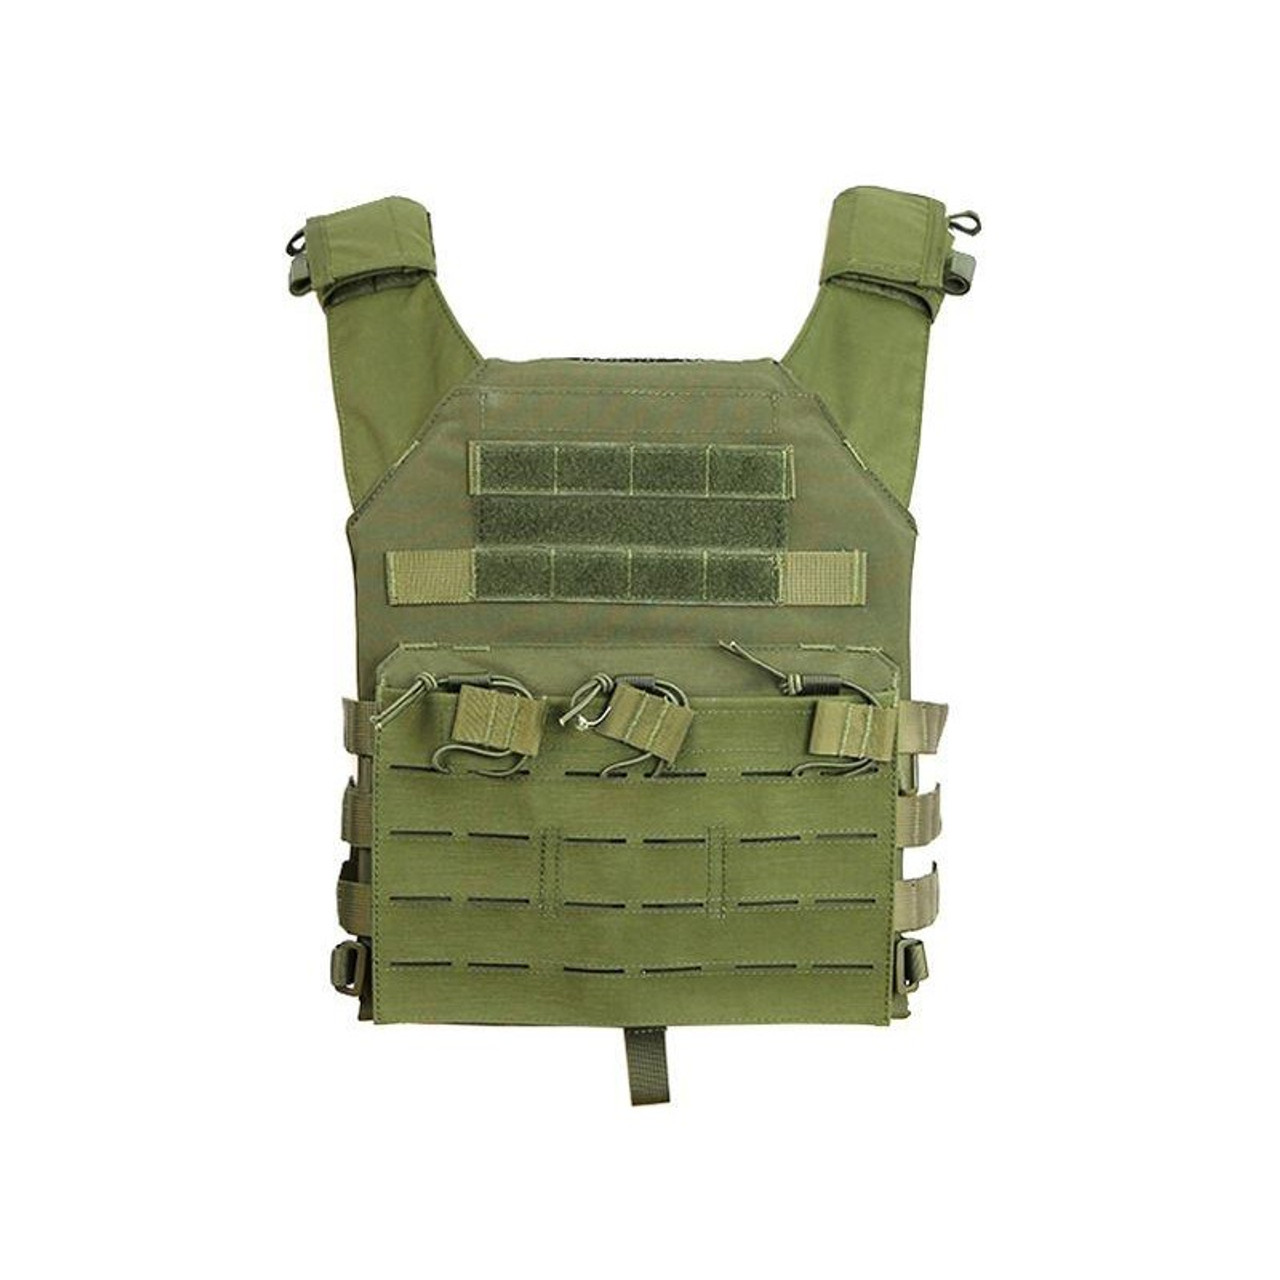 Big Foot JPC Tactical Vest Strengthened - OD